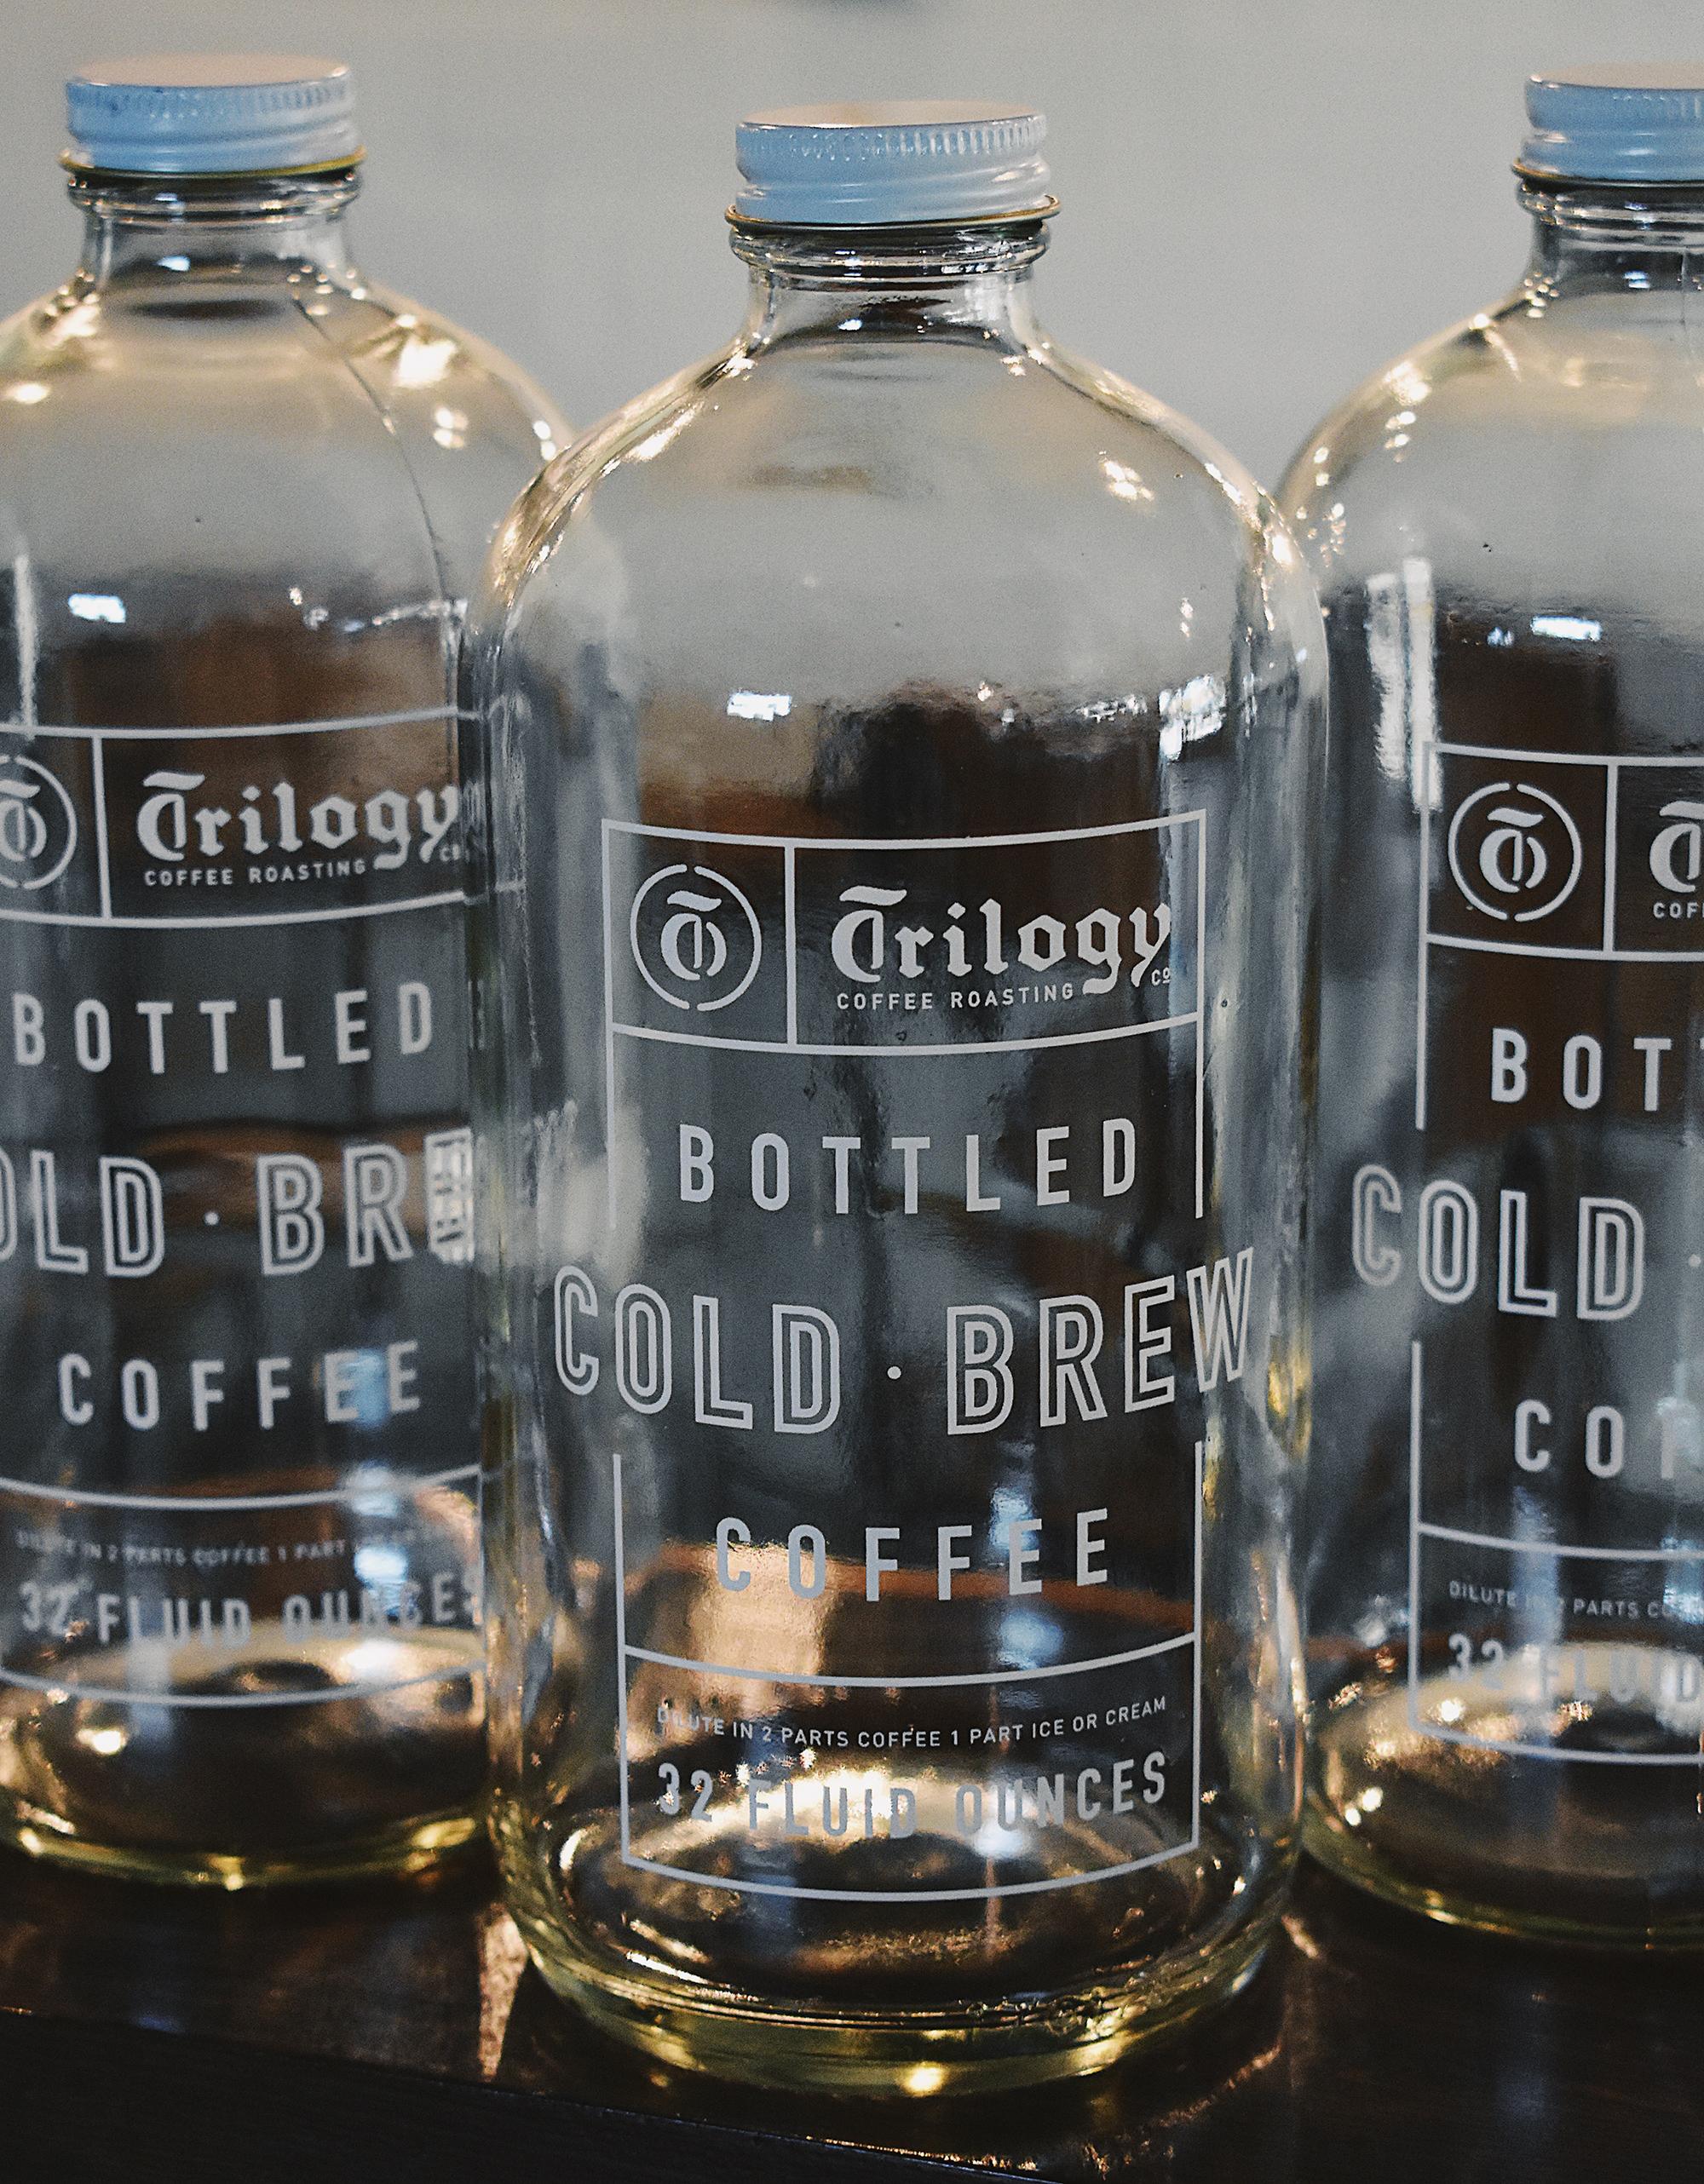 trilogy_bottles_photo.jpg